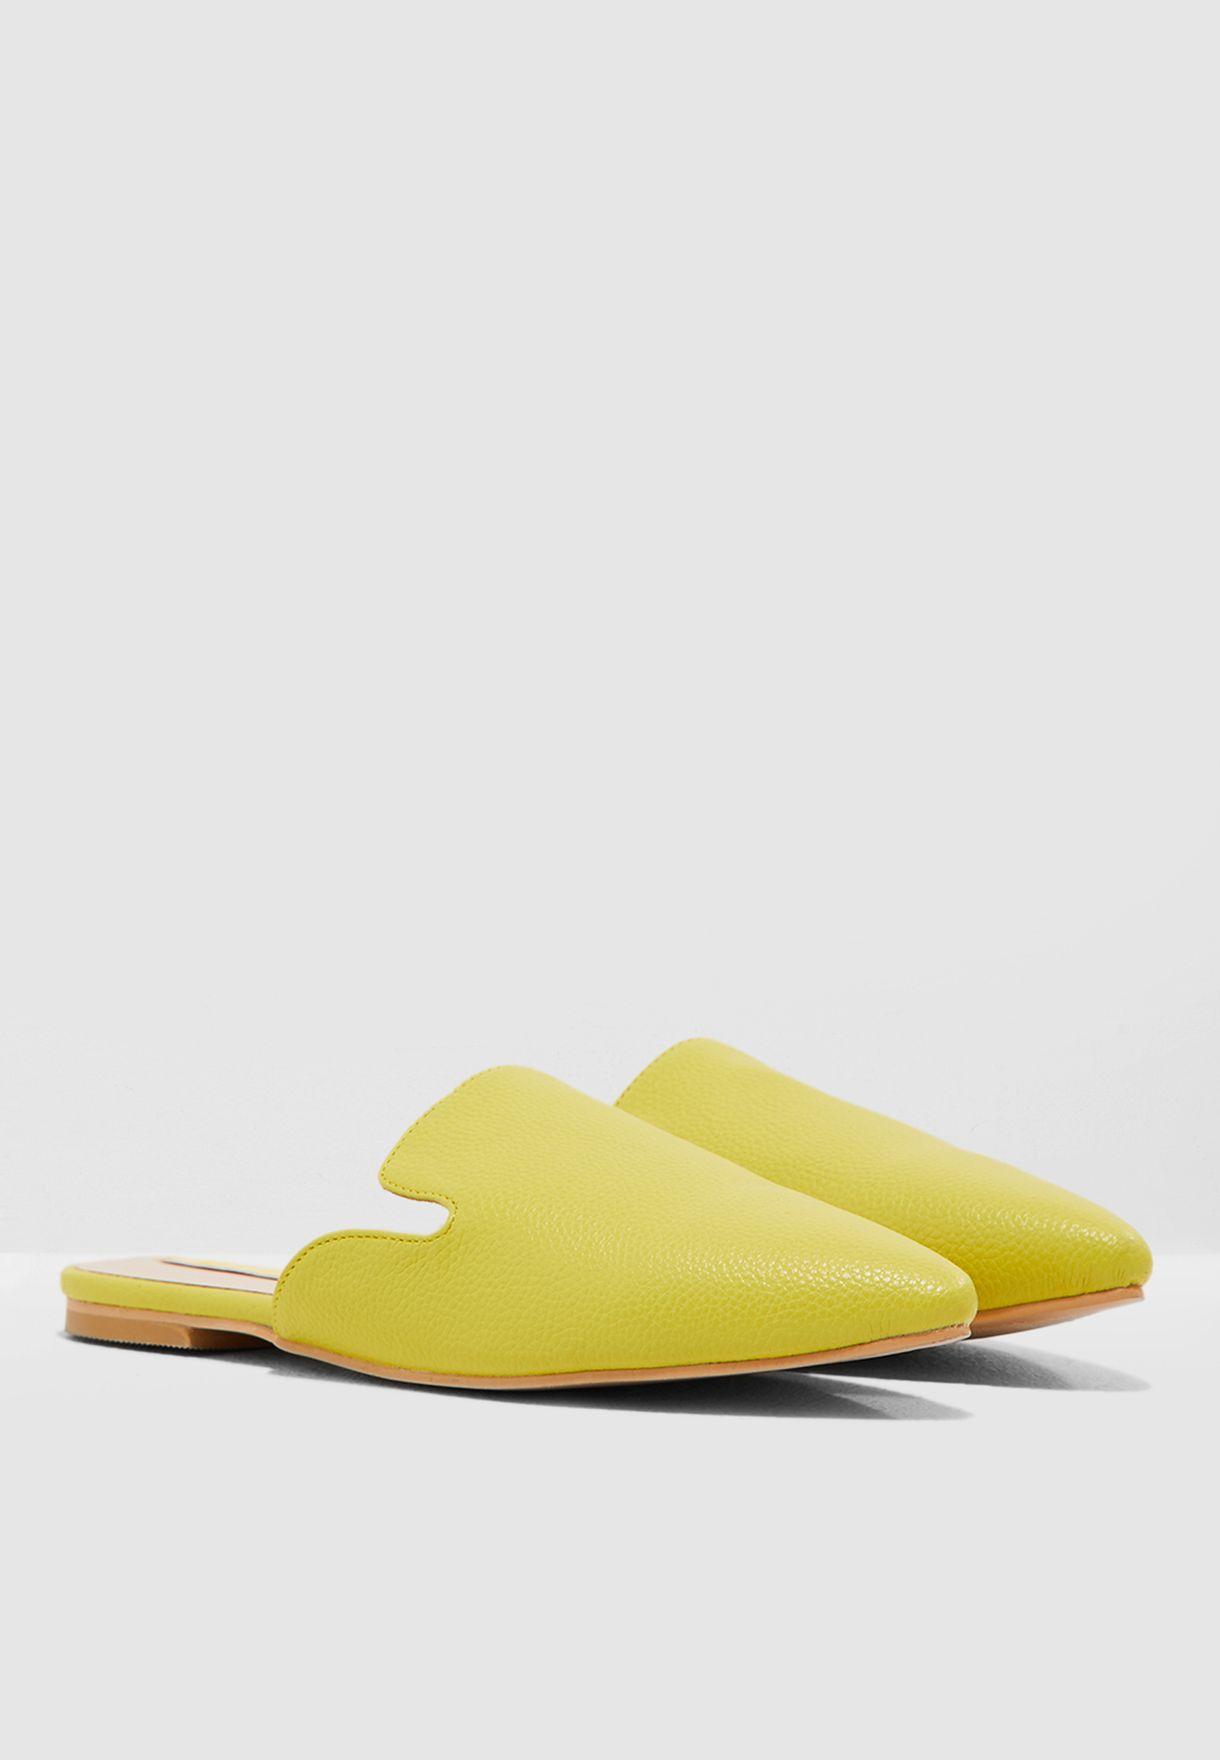 Flat Slip On Shoe